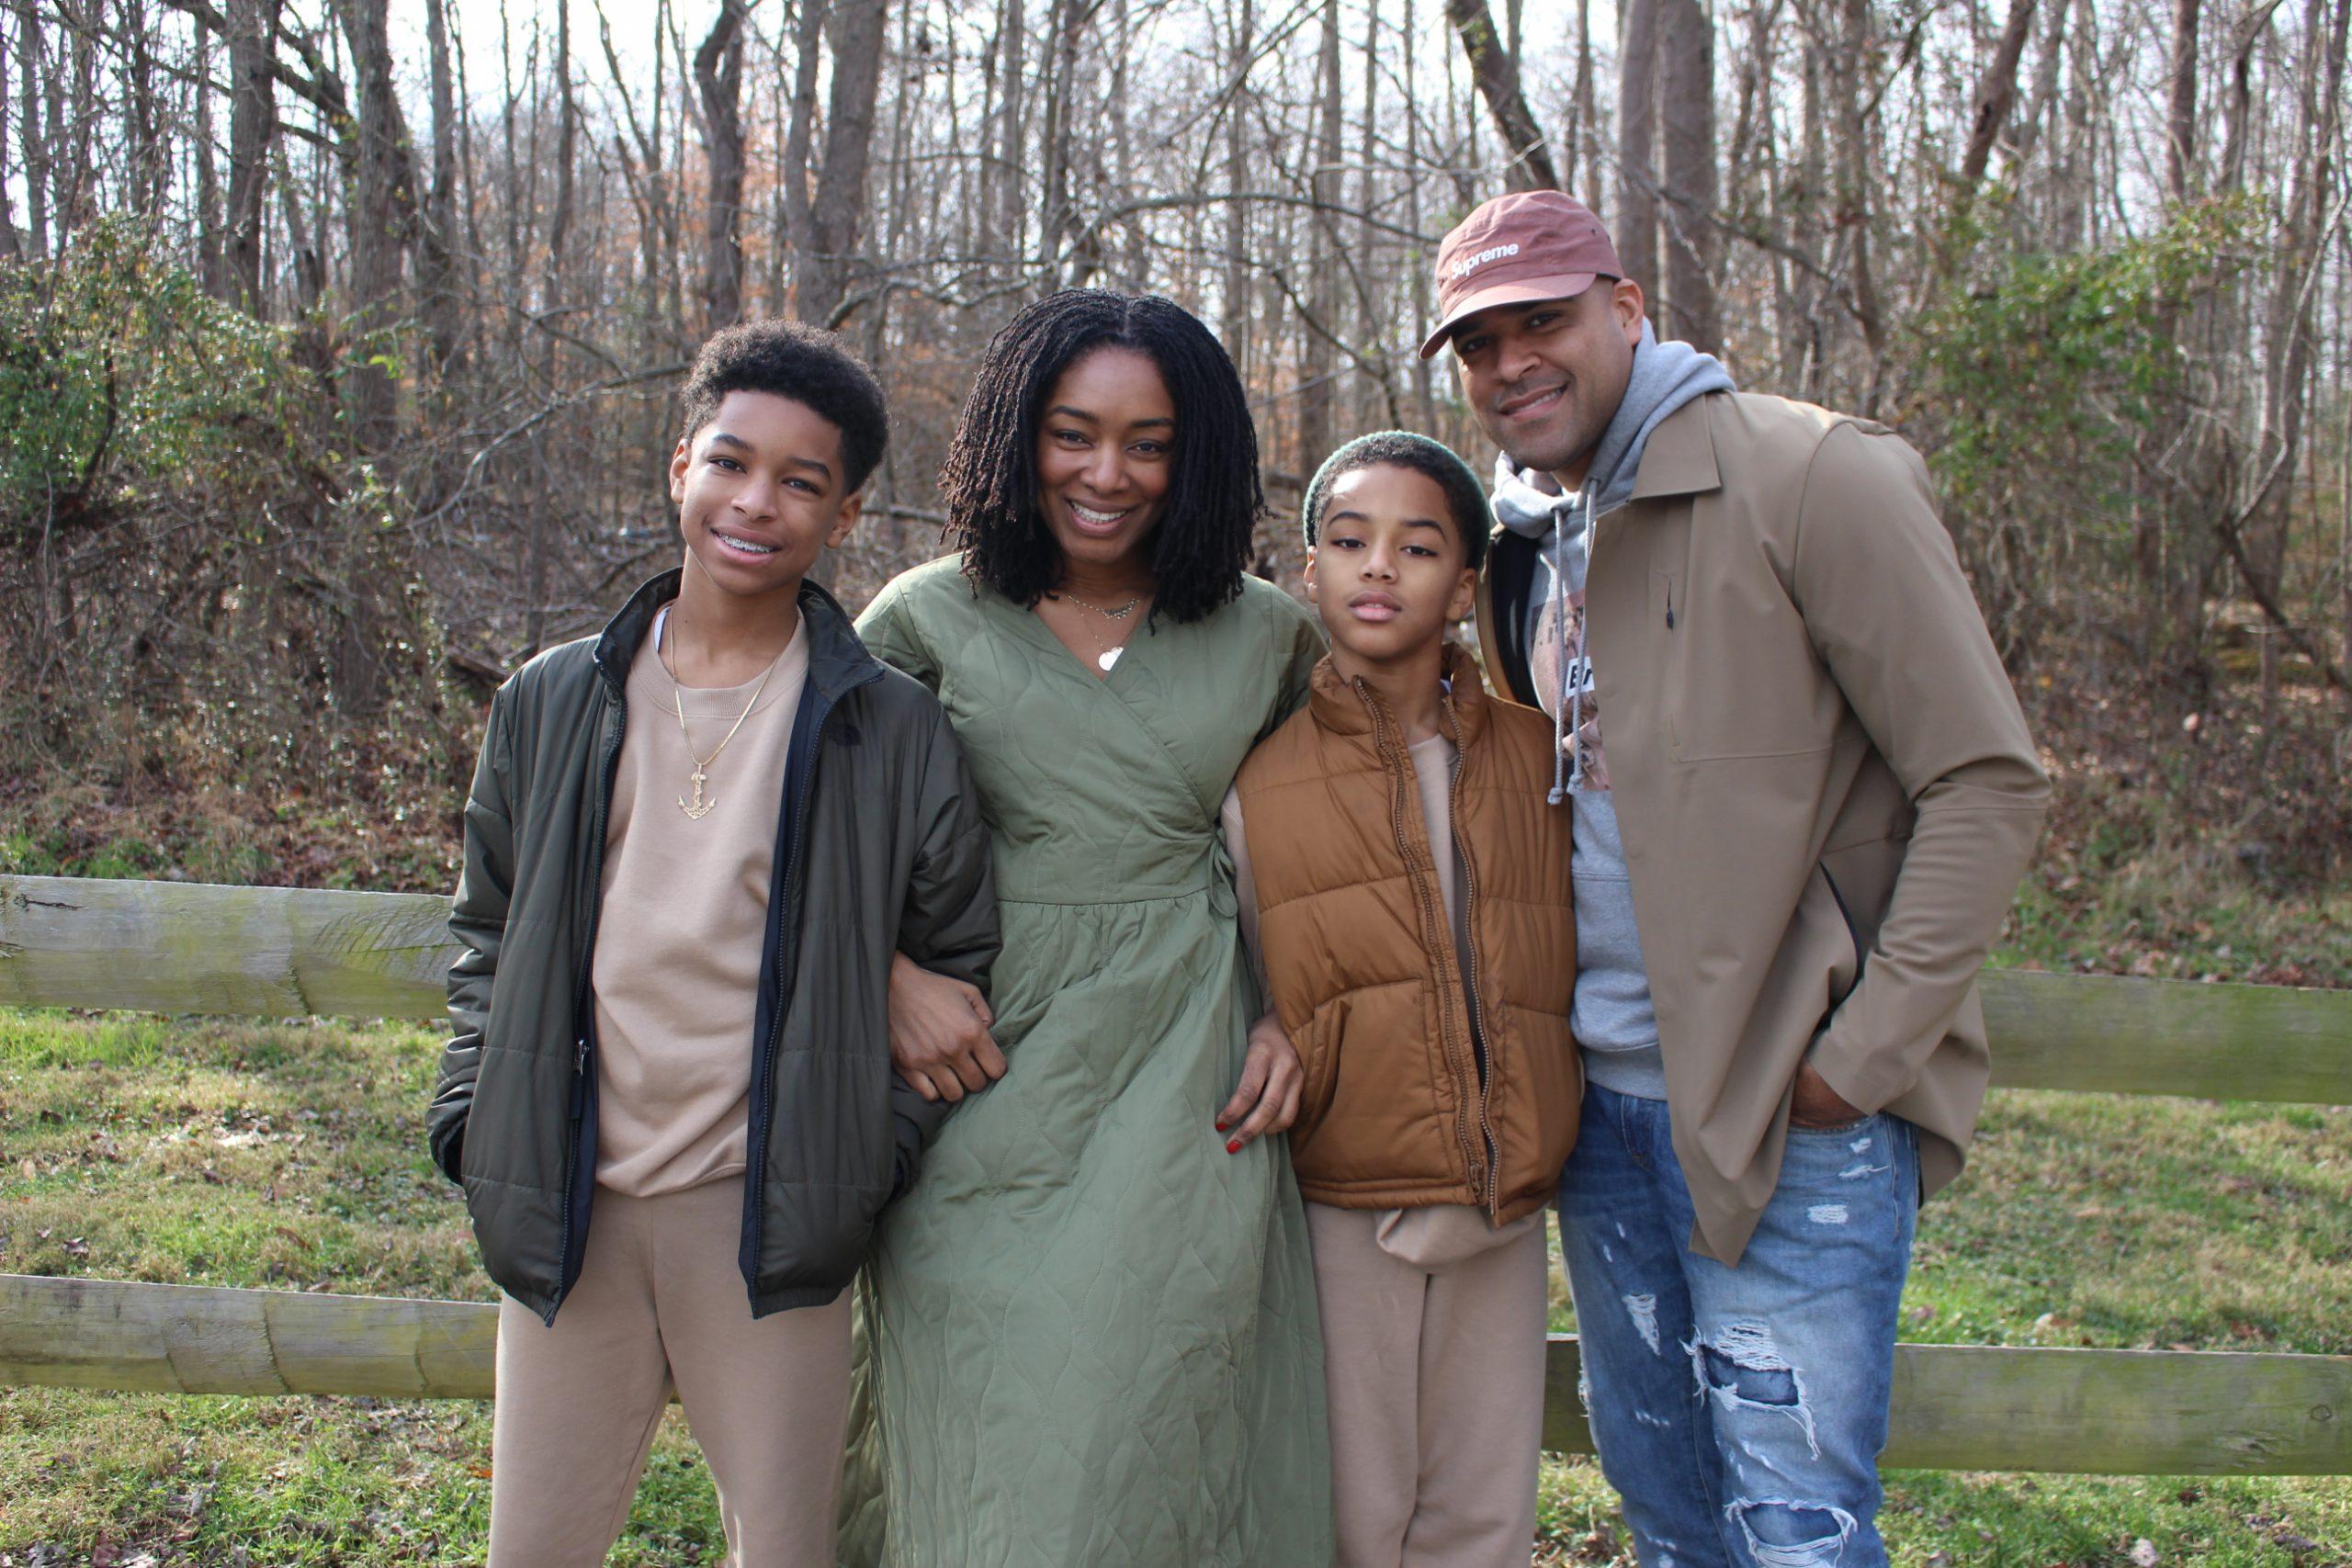 Family Therapy in Birmingham AL - Exceeding Contentment Behavioral Health Inc. - 2592x1728